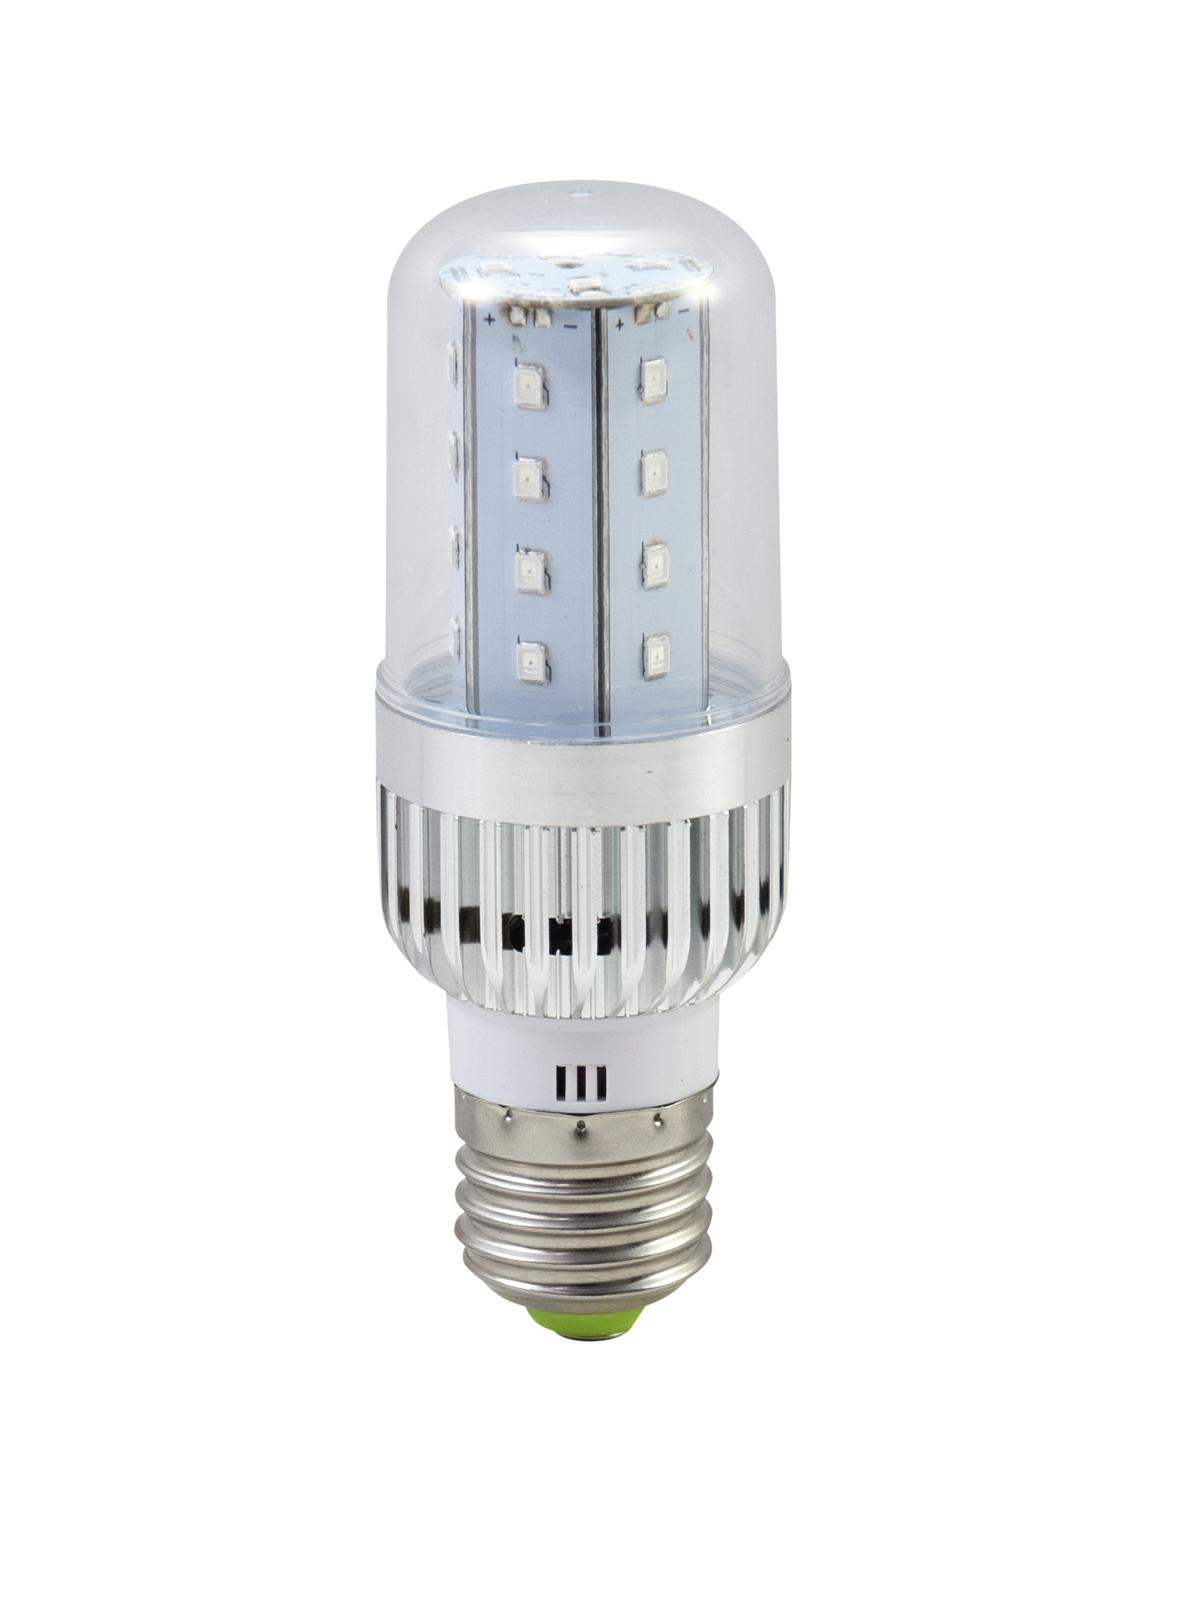 OMNILUX LED E-27 230V 5W 28 Led UV